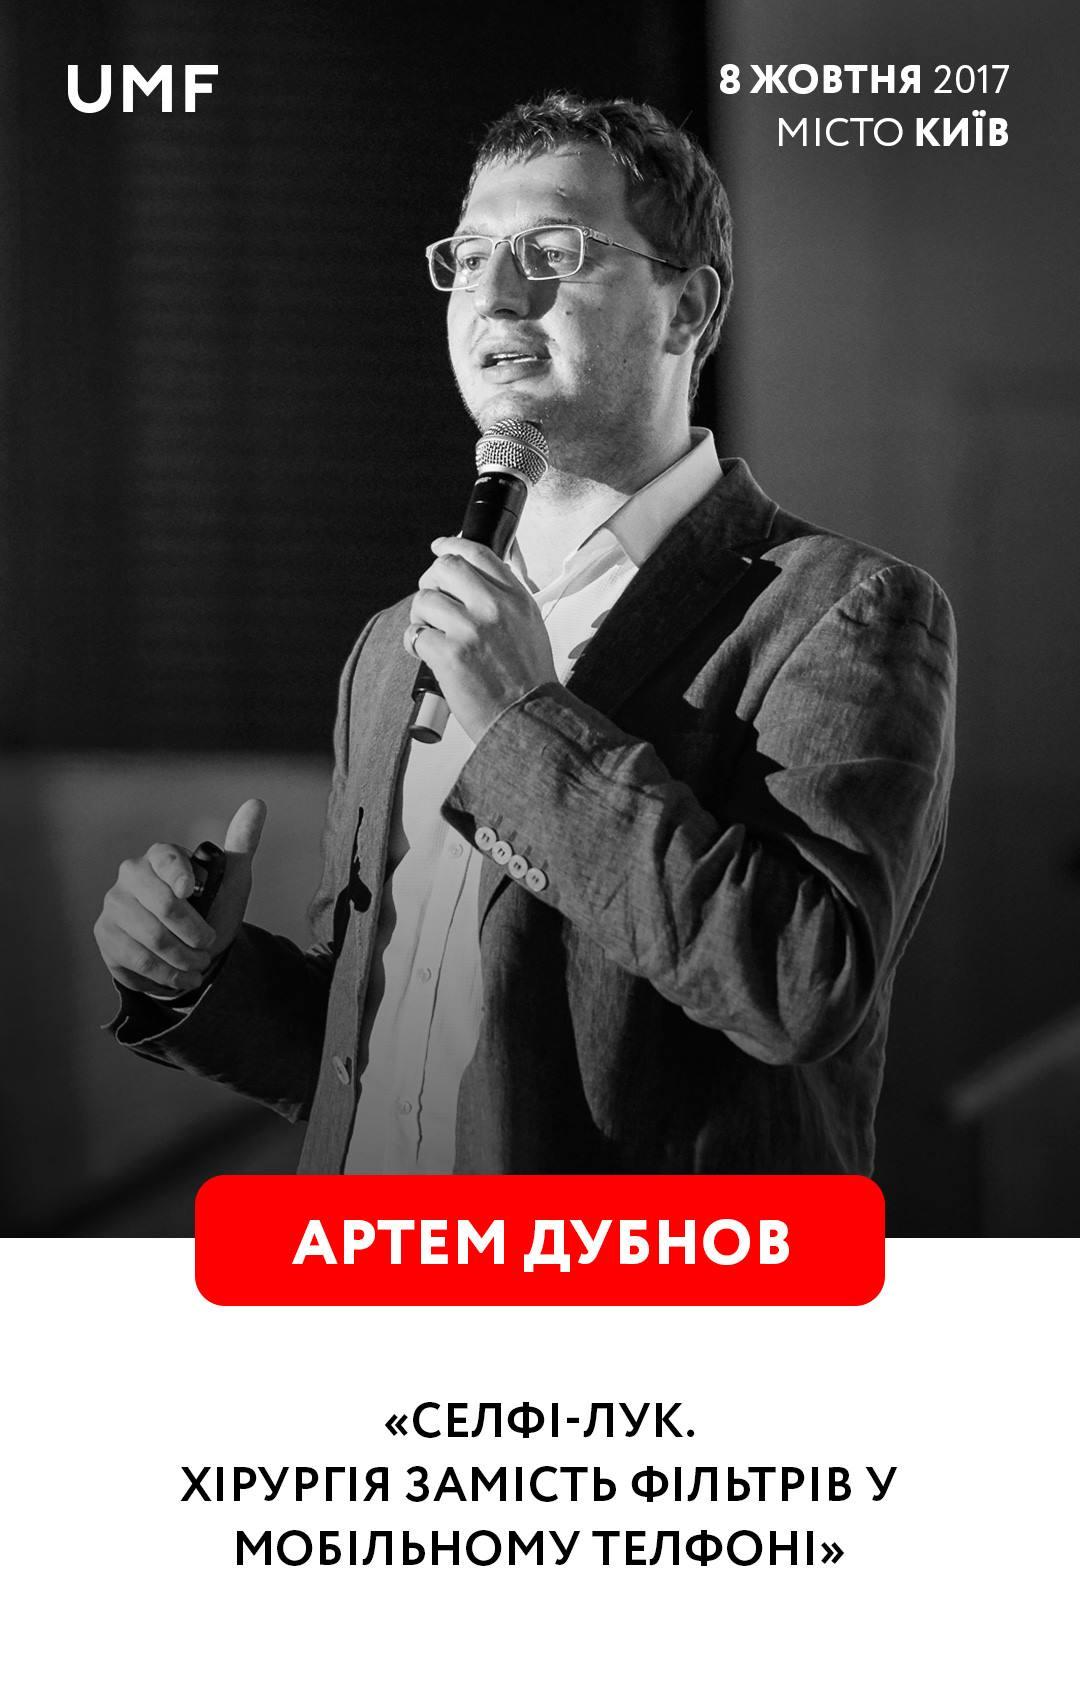 UMF 2_Artem's presentation